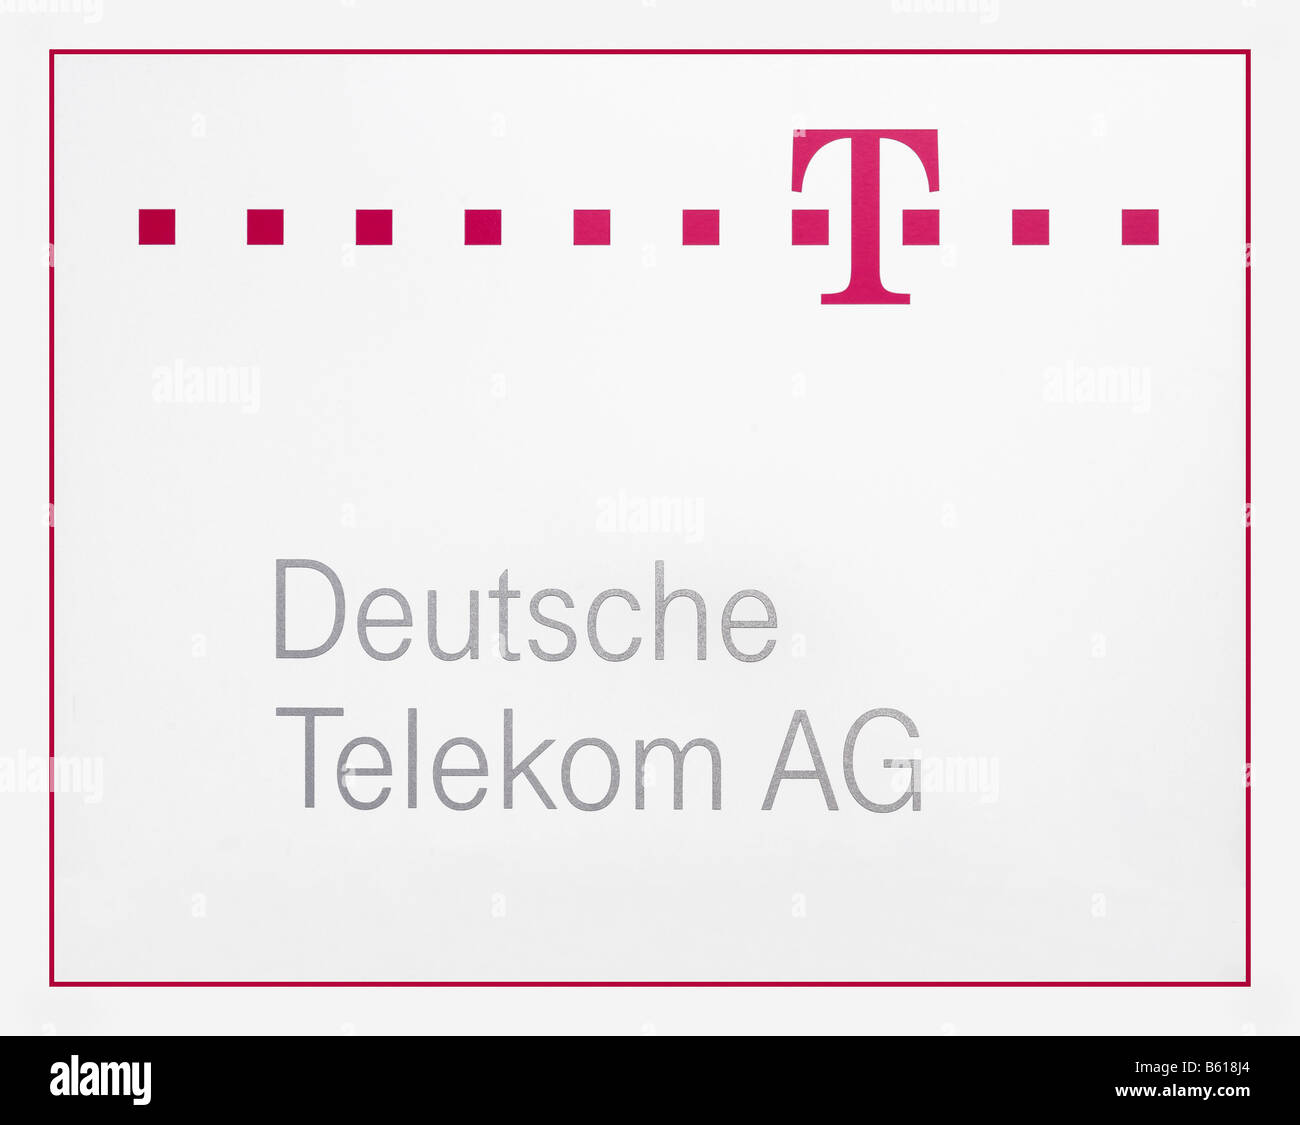 Logo of the Deutsche Telekom AG with logotype - Stock Image